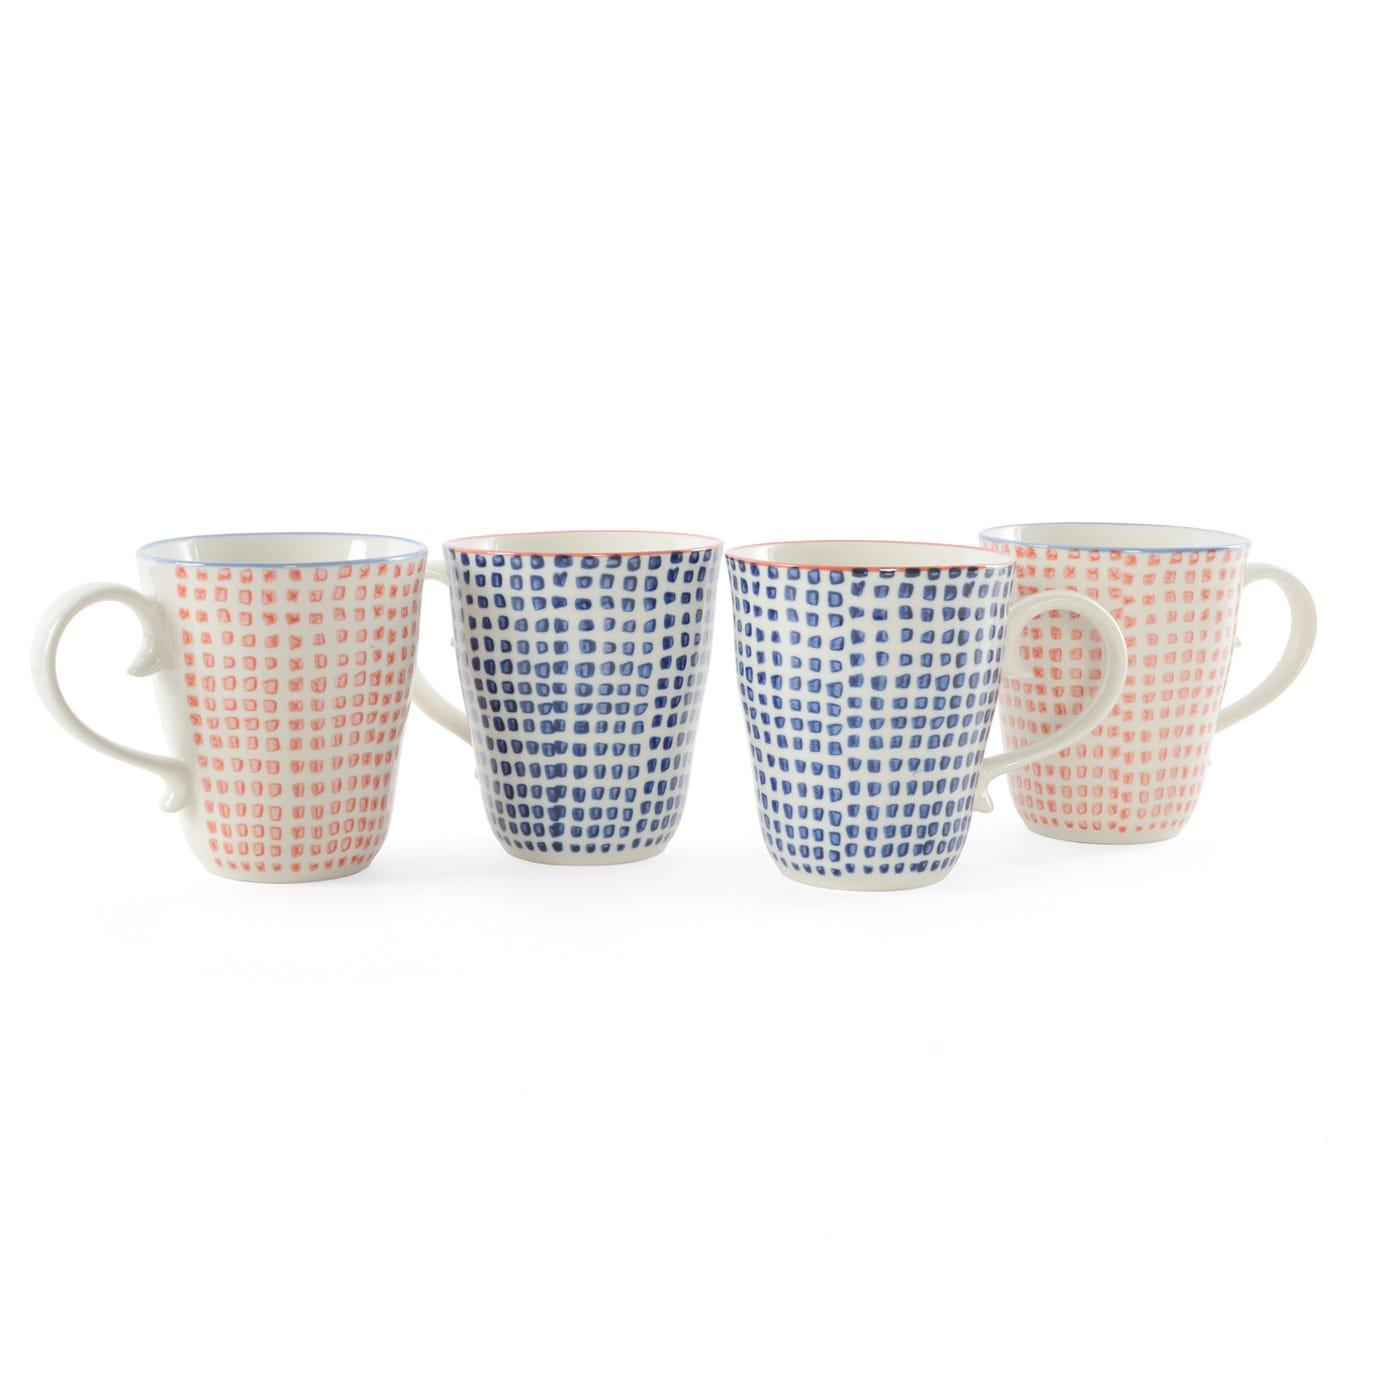 Pols Potten Block Mugs Assorted Set Of 4 Heal S